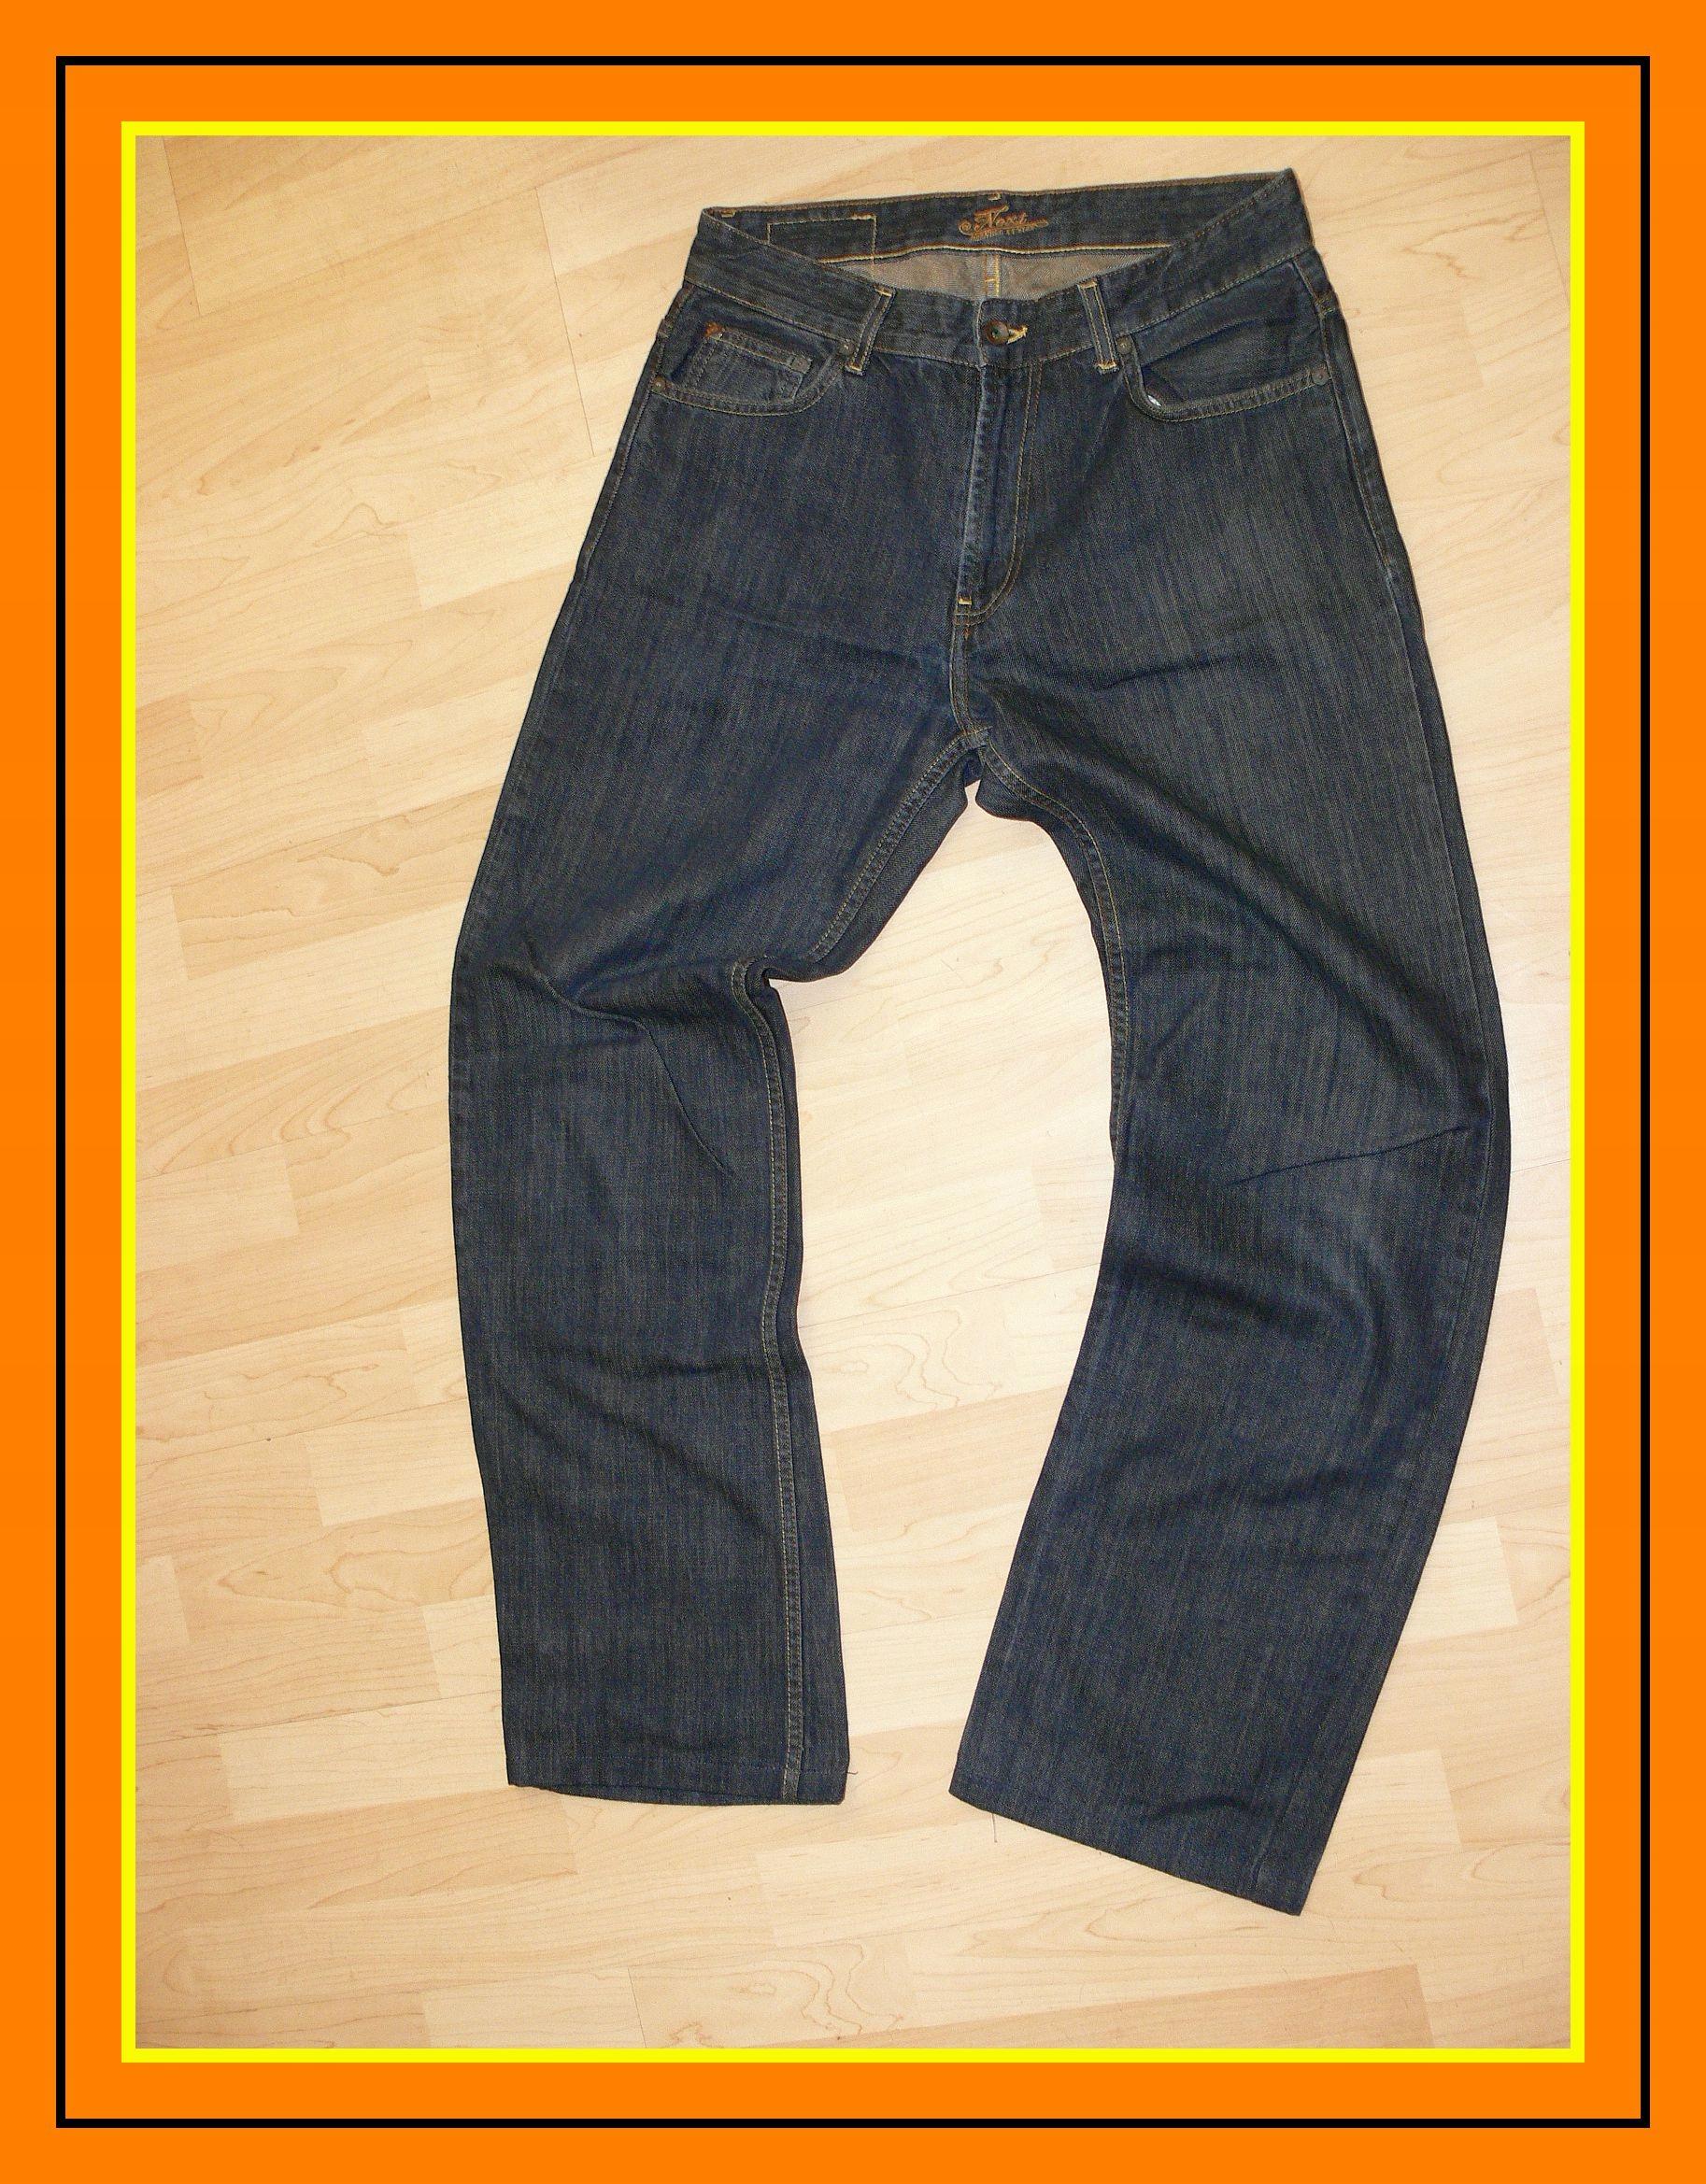 SALE SOLIDNE spodnie = NEXT 501 jeans=32 33 82 84